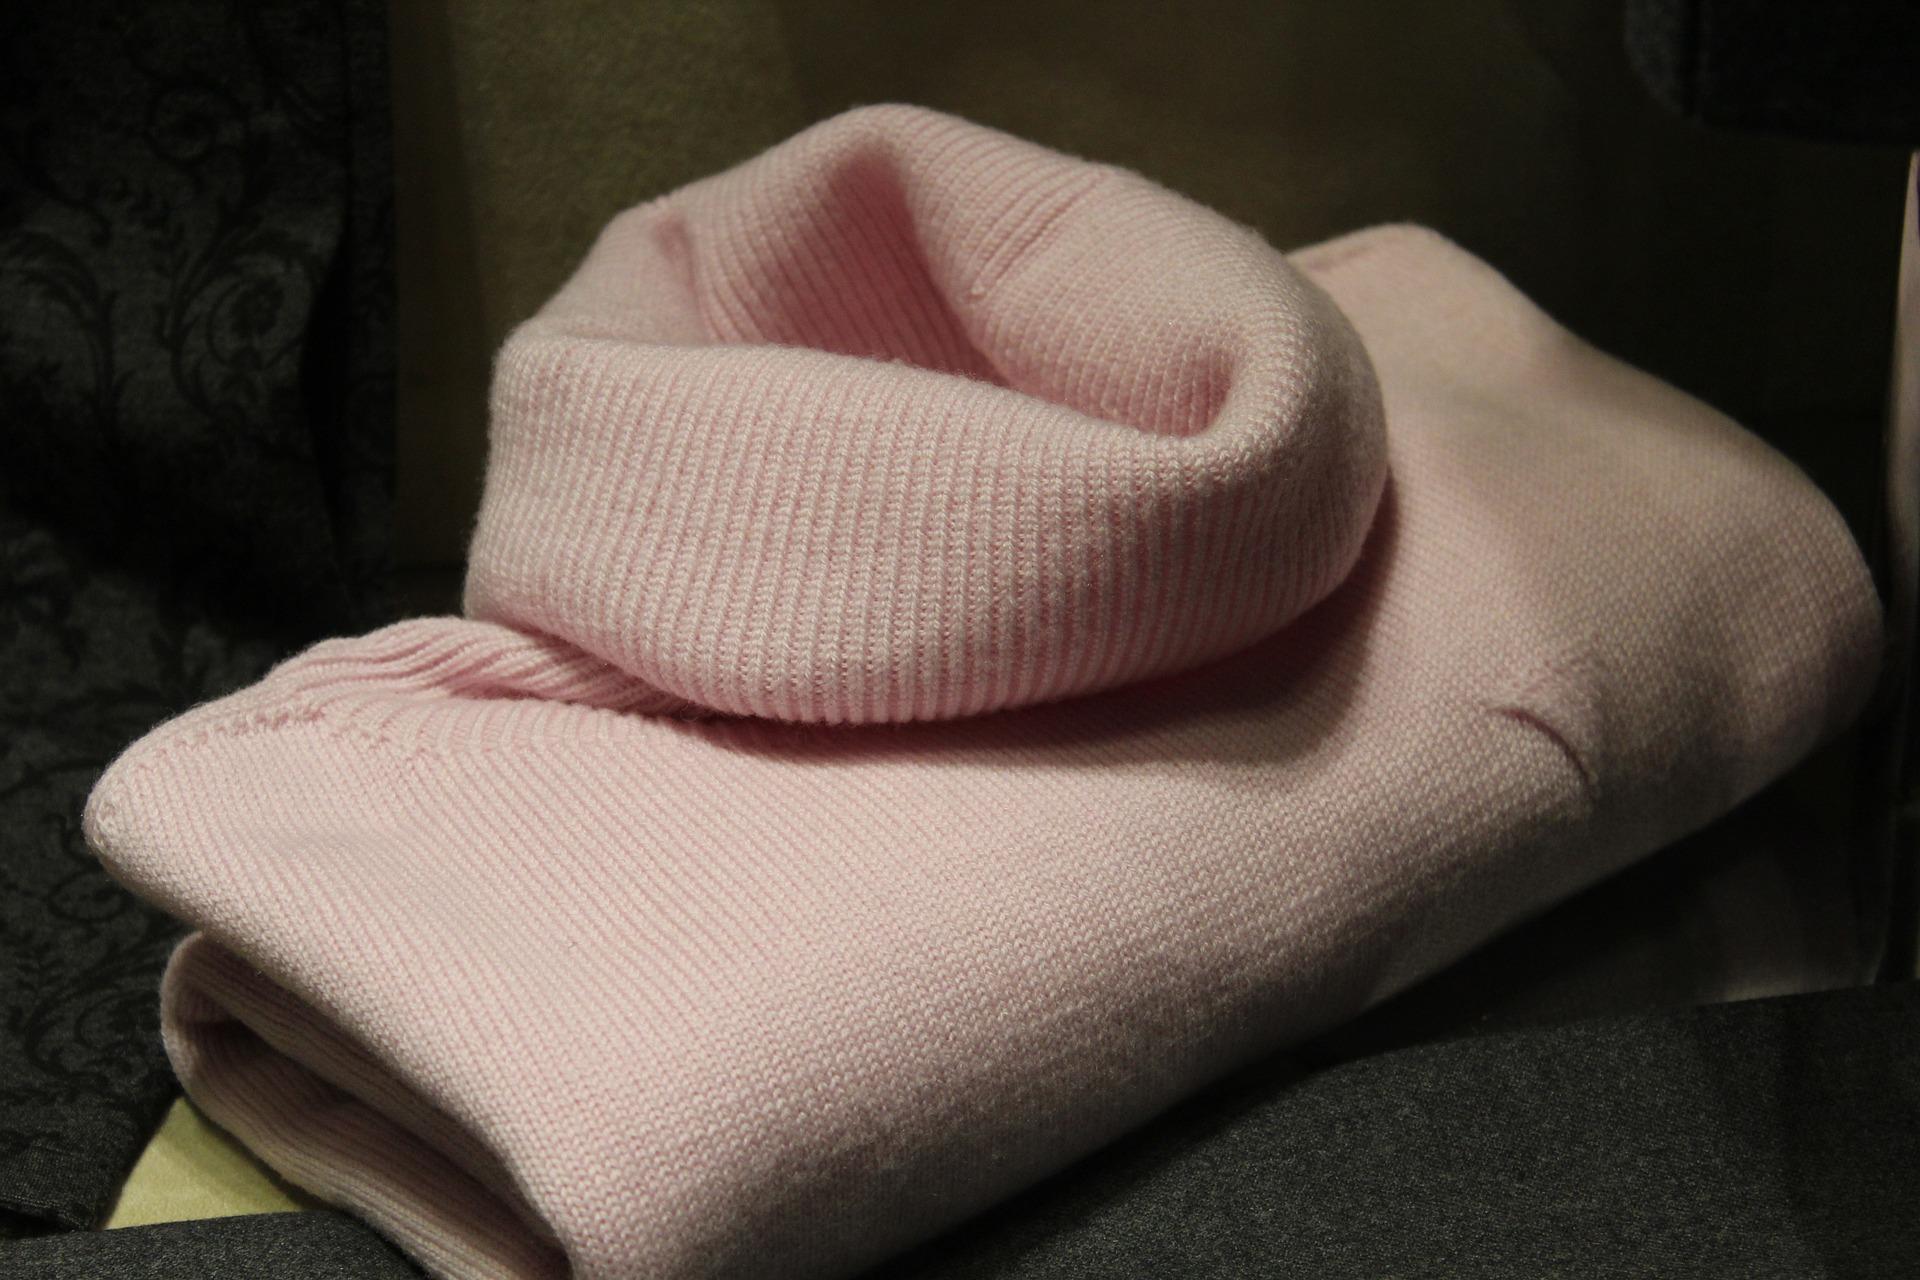 sweater-1222876_1920.jpg